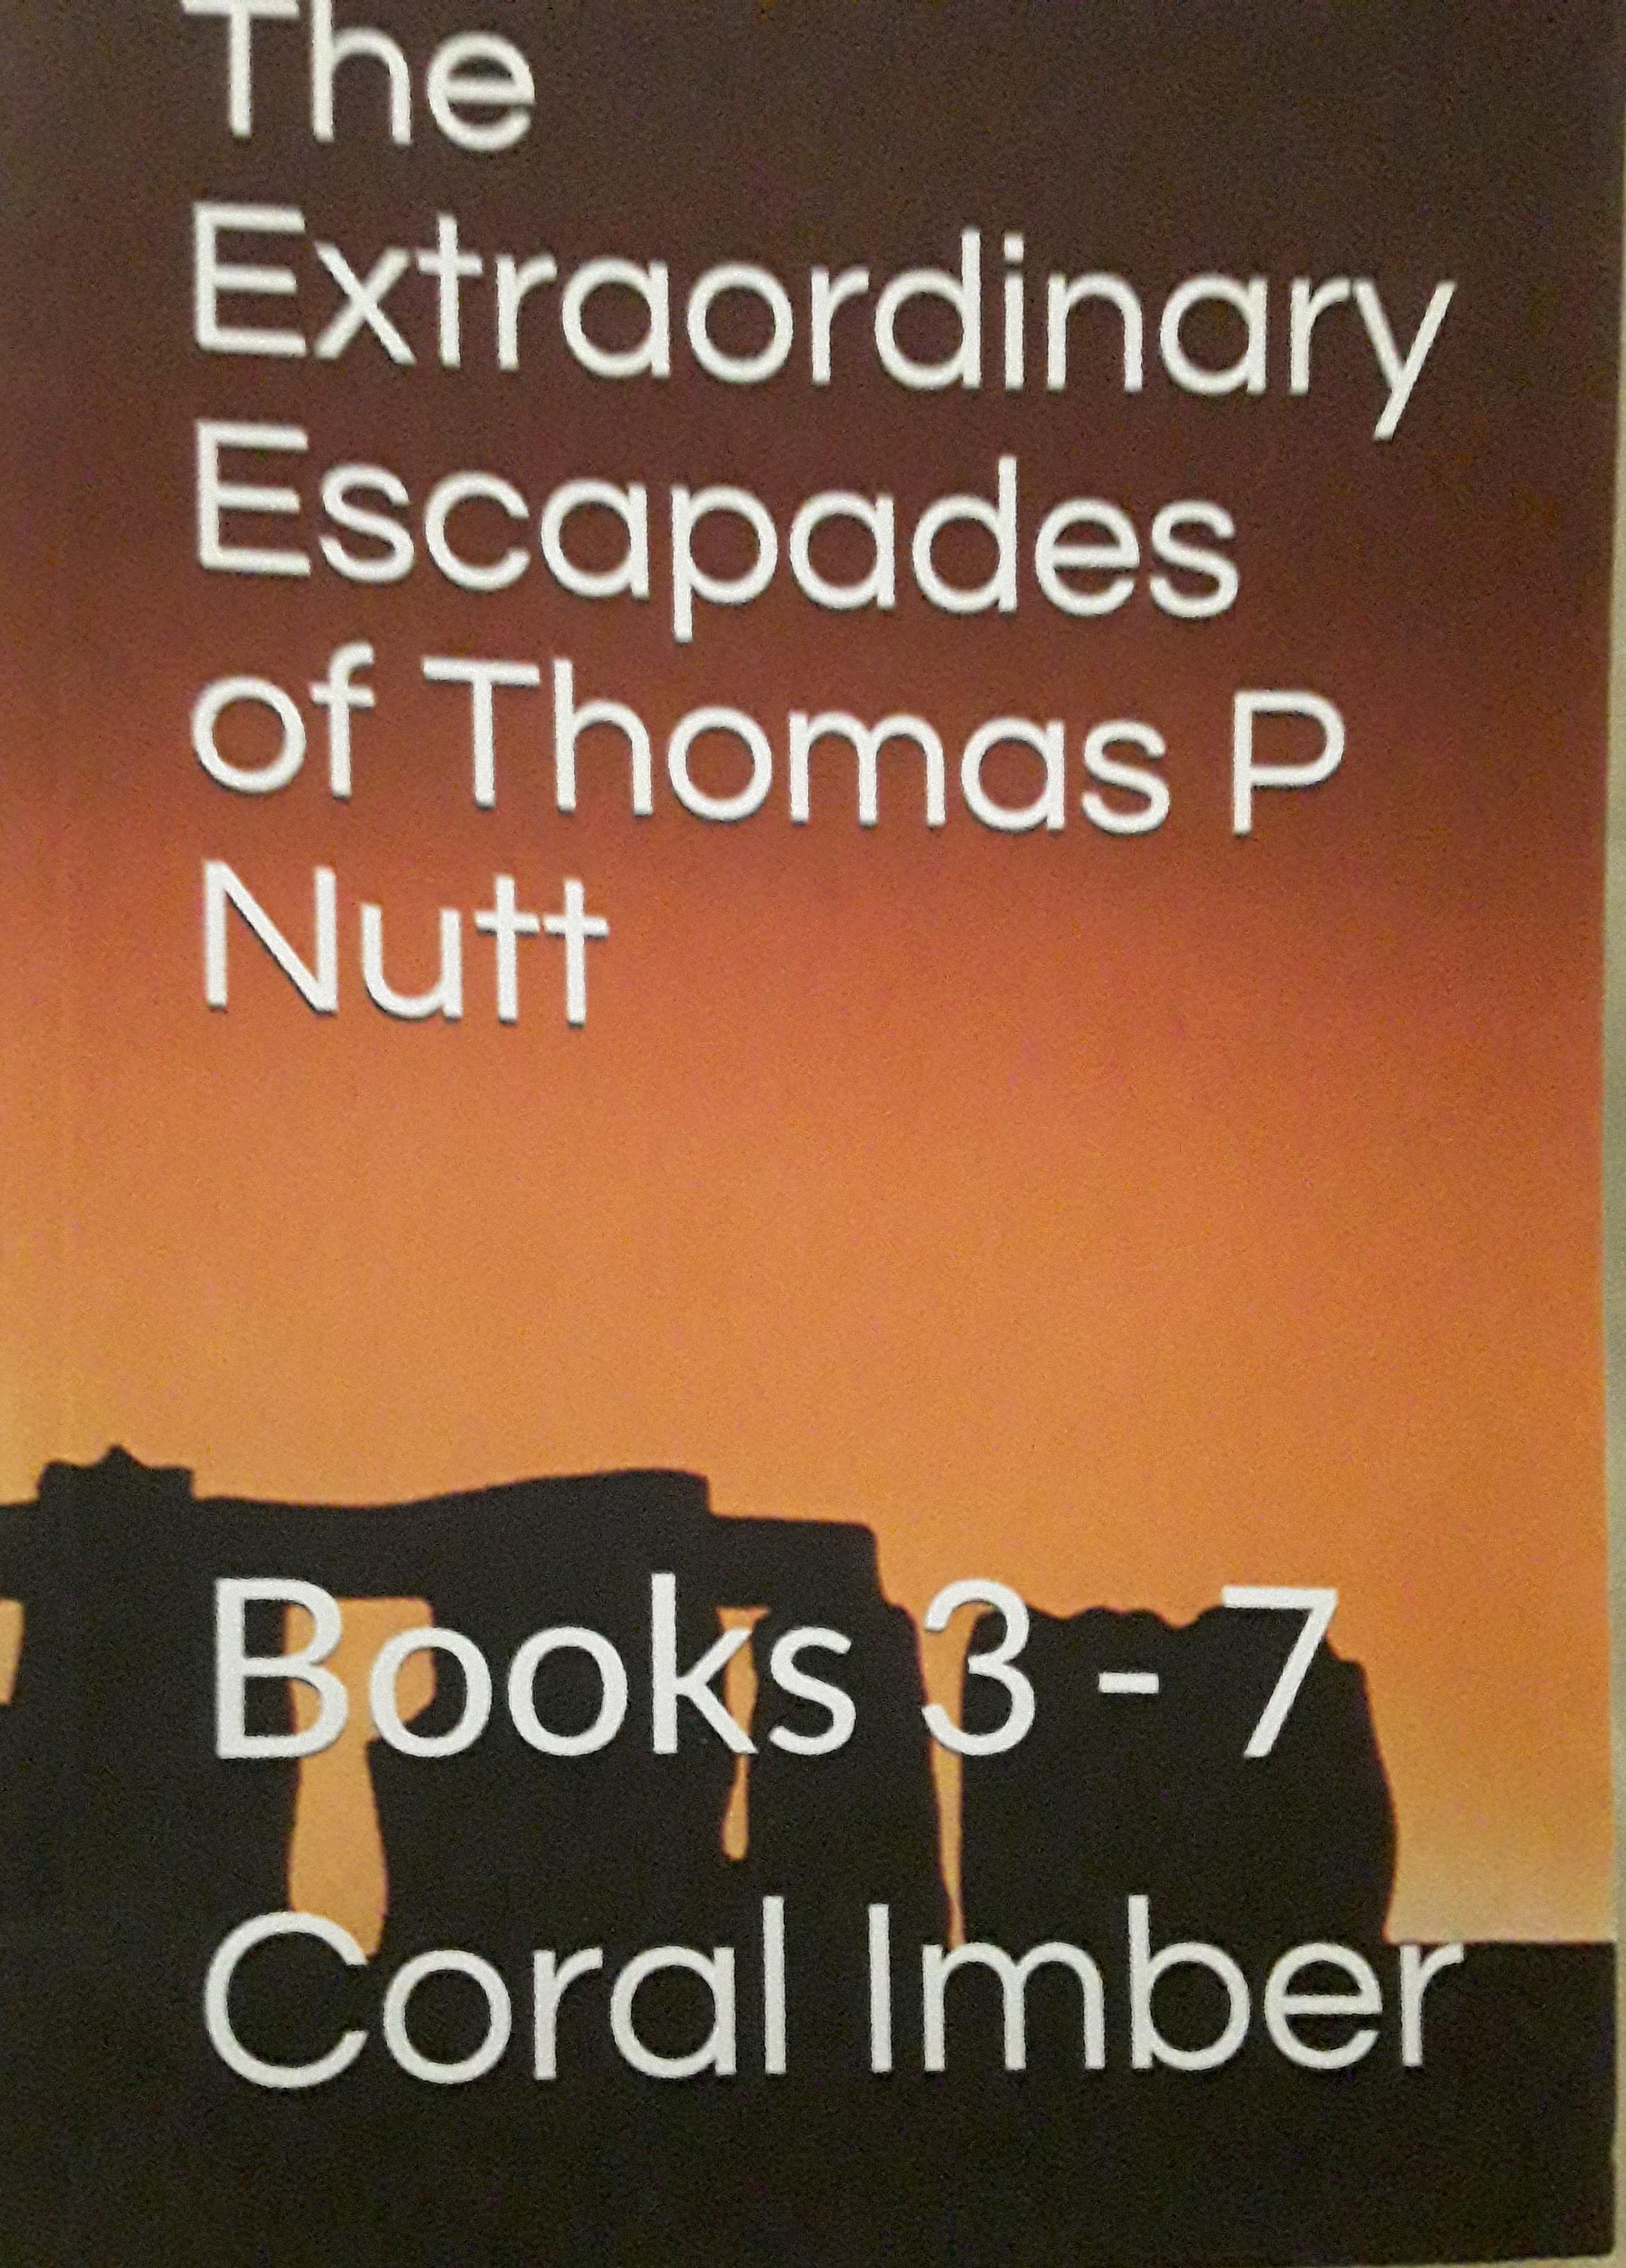 The Extraordinary  Escapades of Thomas P Nutt (books 3-7)